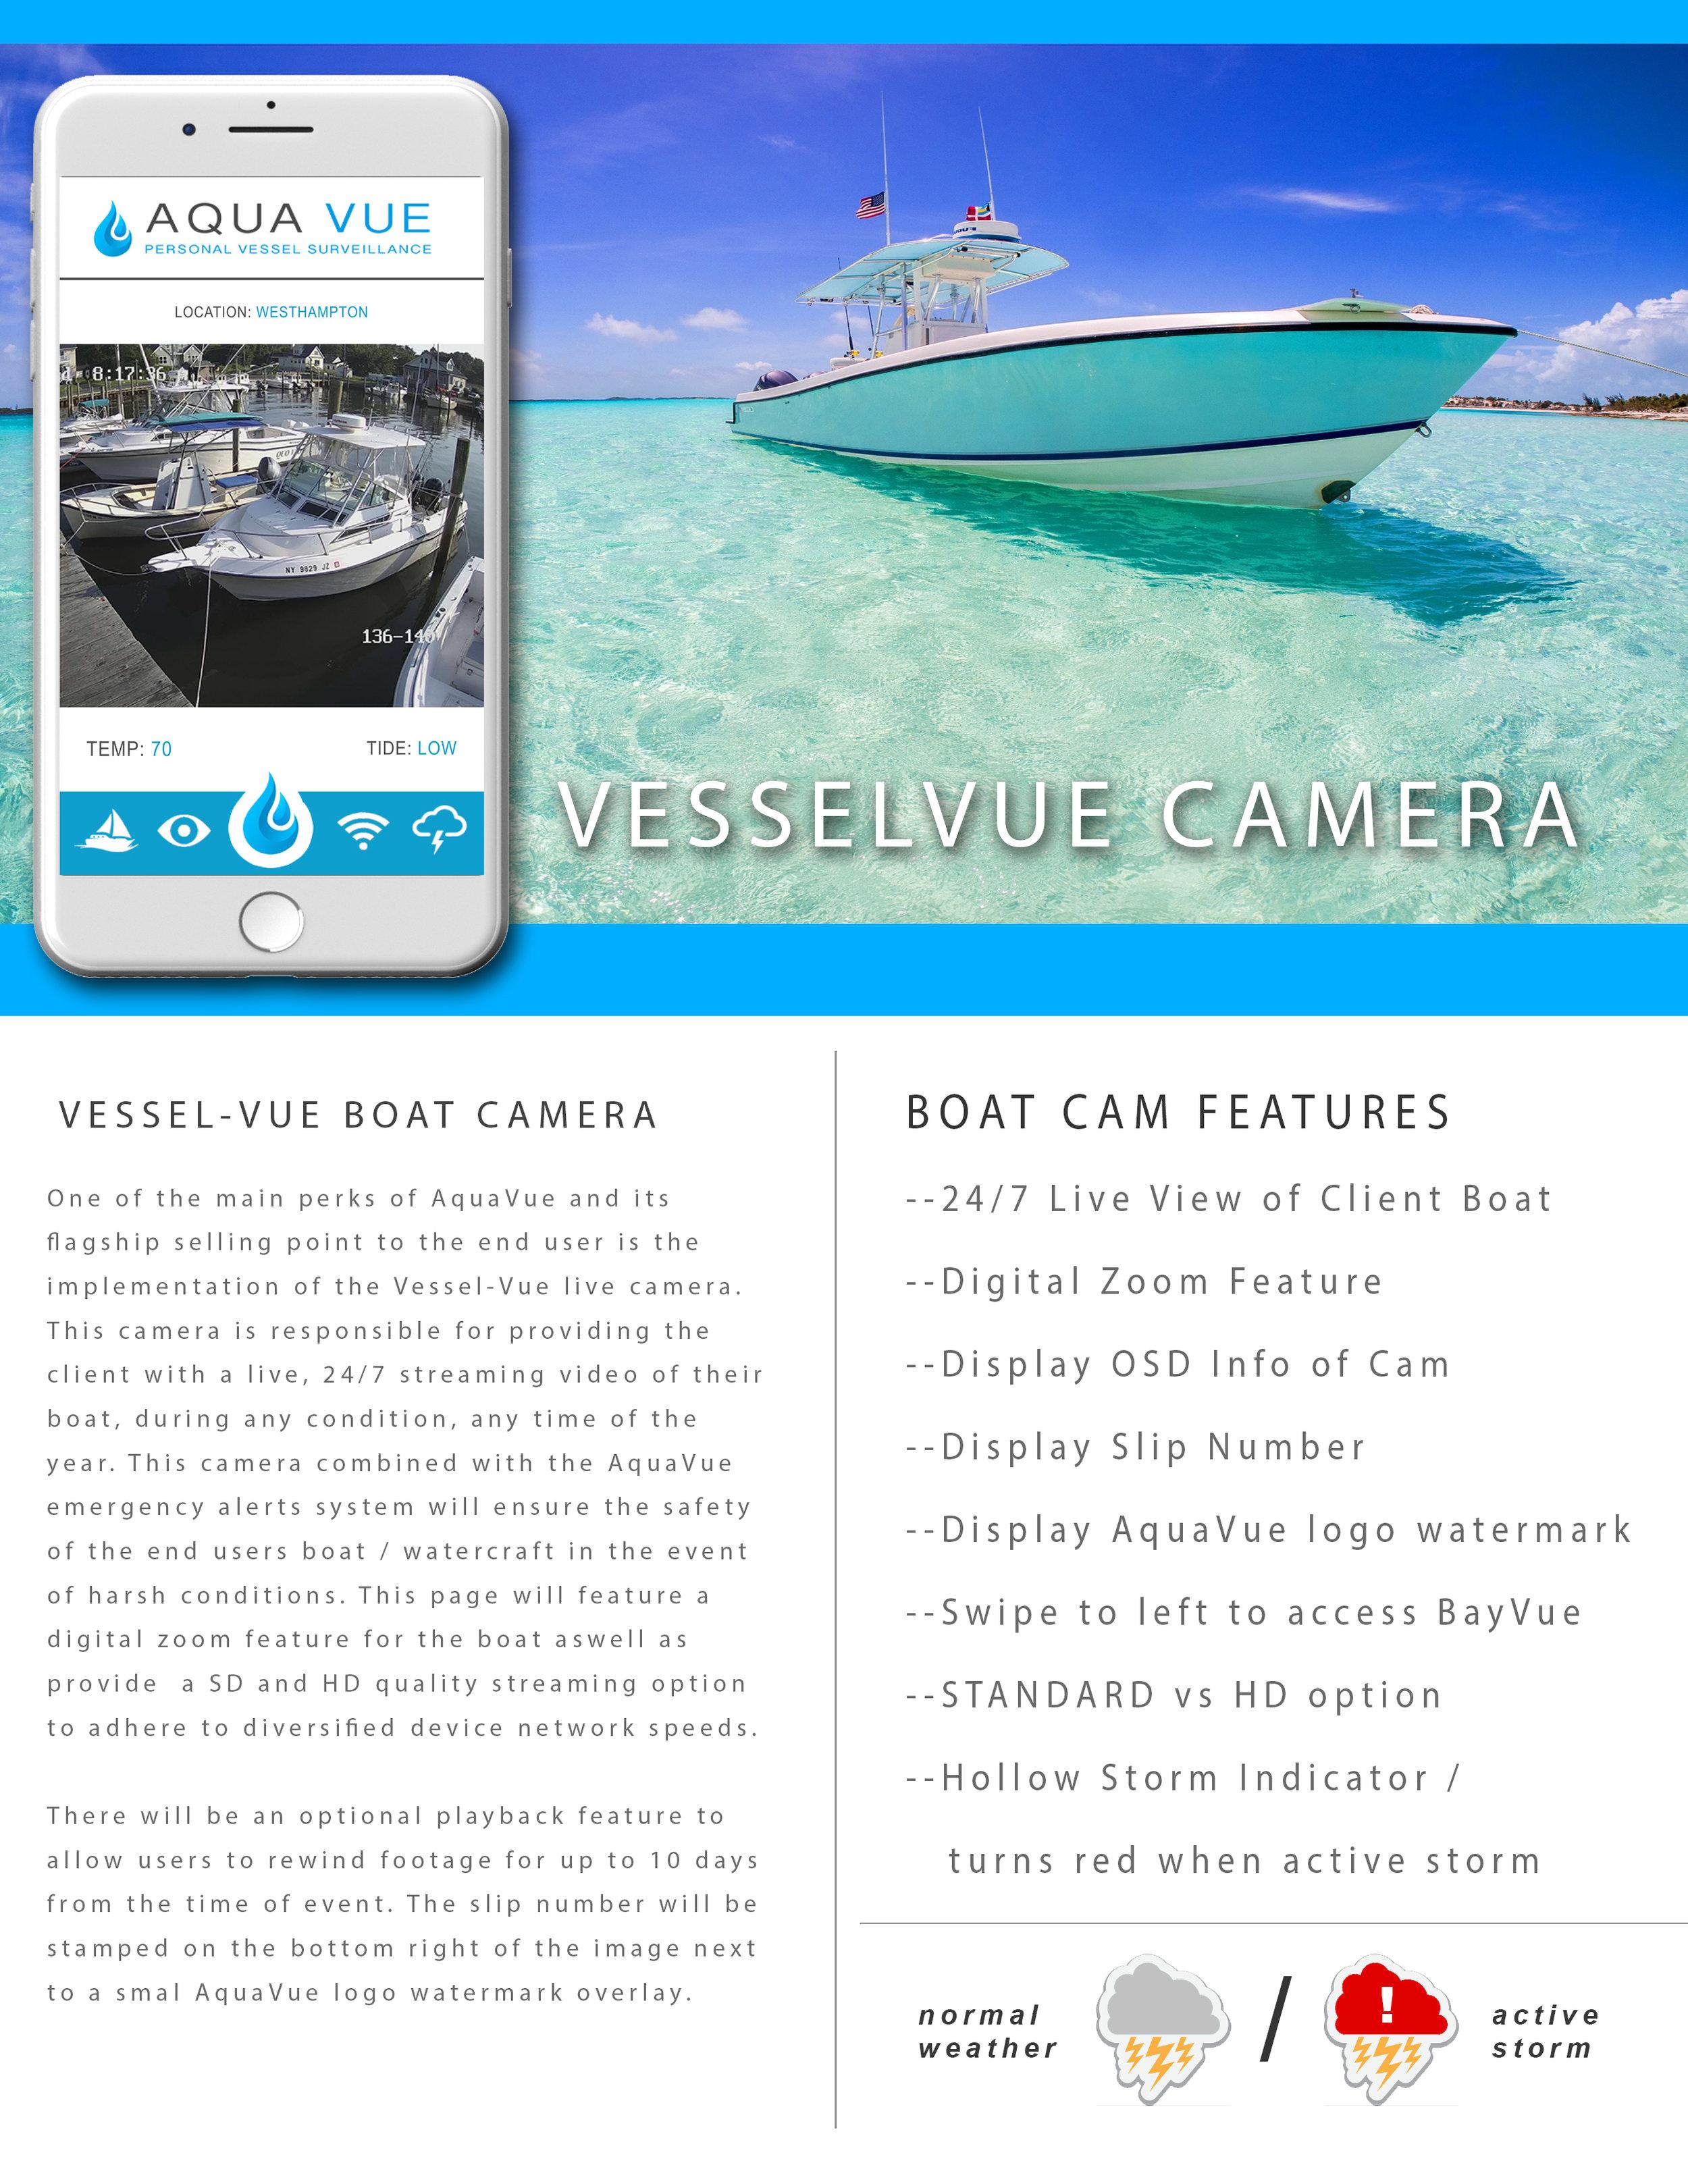 7-Aquavue Specs - BoatVue.JPG